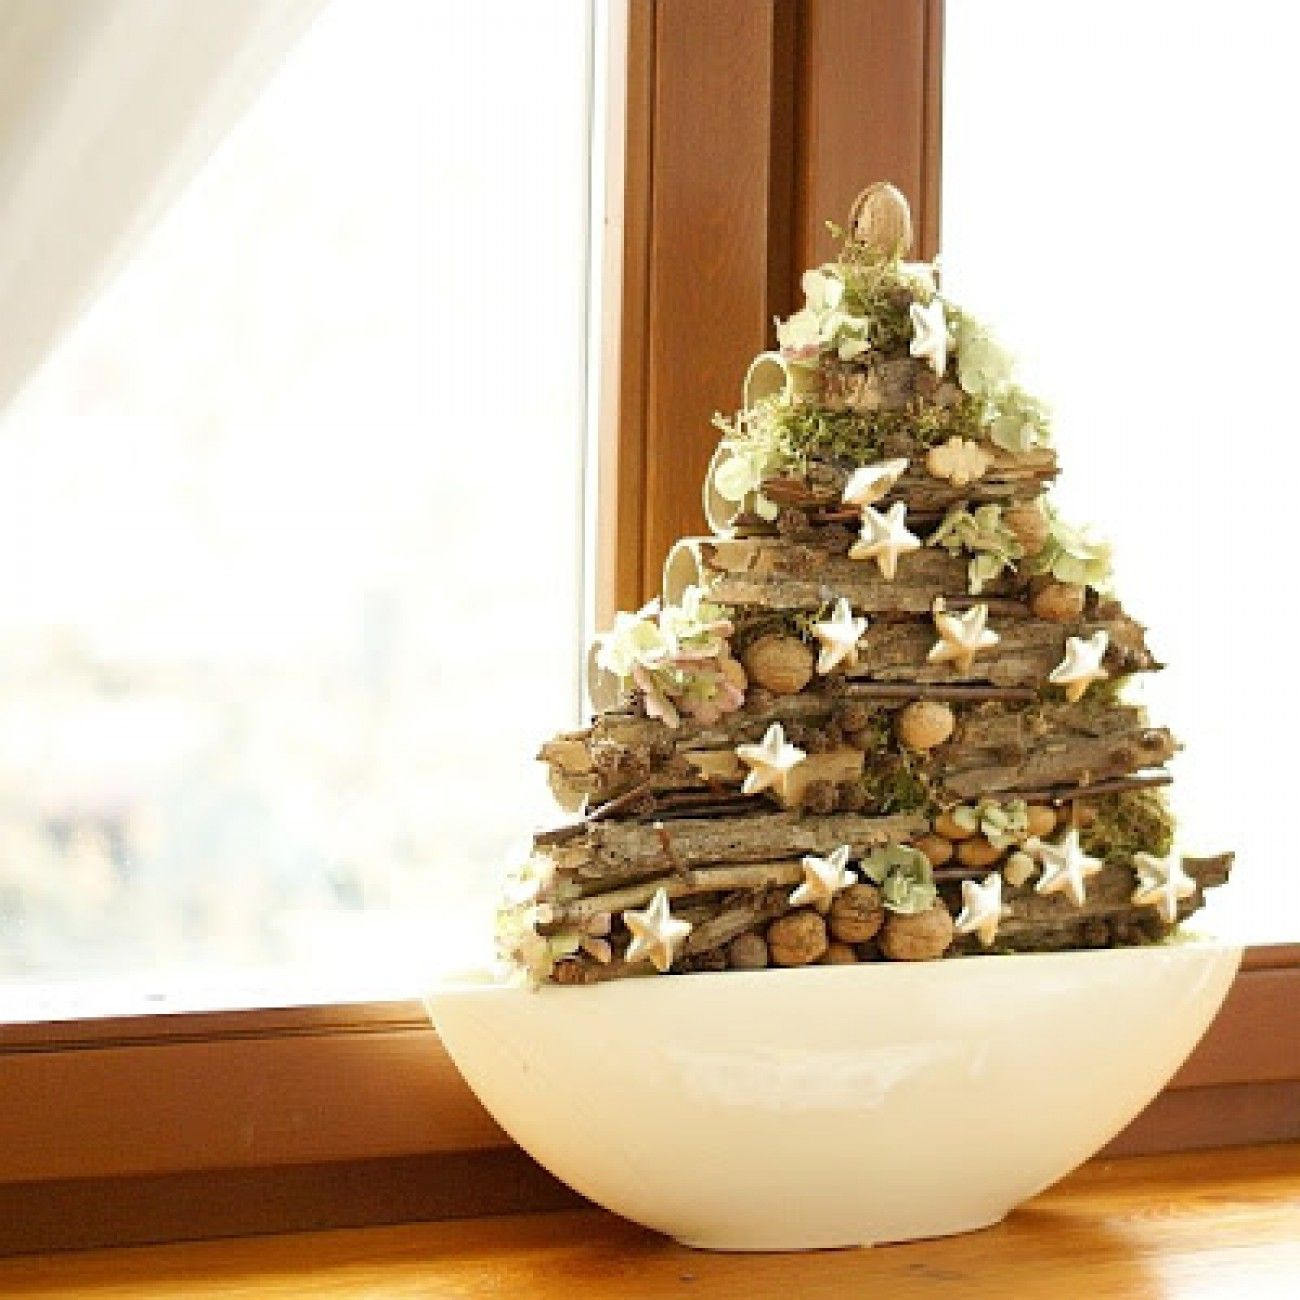 Mooie kerstdecoratie om zelf eens te maken weihnachtlicher tafelschmuck pinterest - Moderne weihnachtsdekoration ...